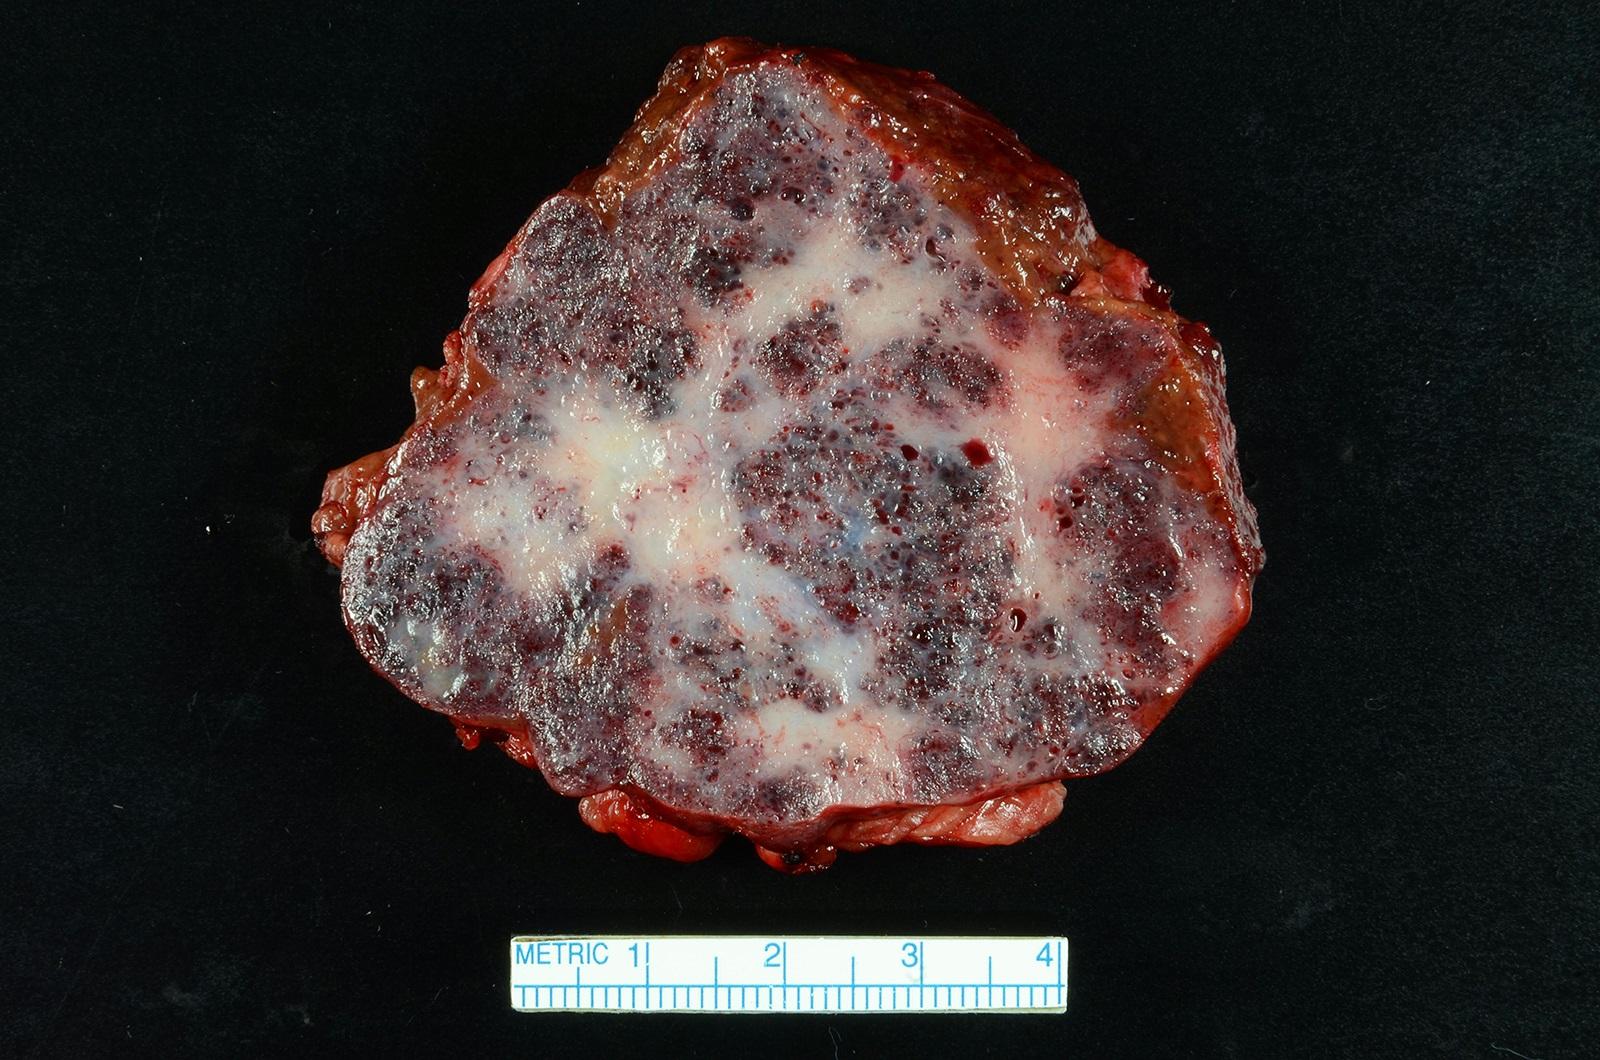 Cavernous hemangioma